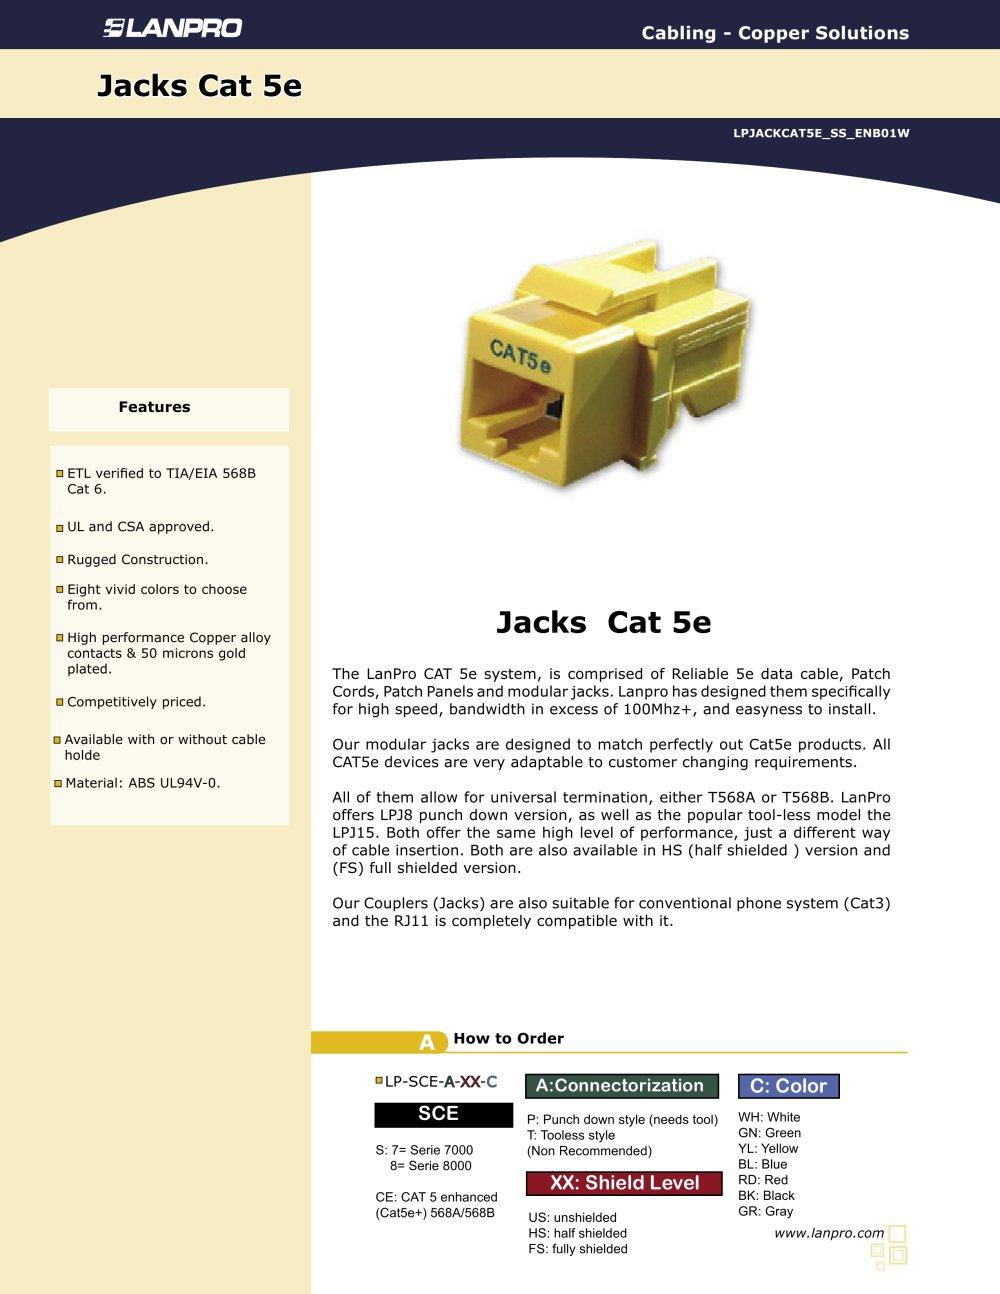 Lpjackcat5e Ss Enb01w Modular Jacks Cat 5e Lanpro Pdf Ce Tech Cat5e Wire Diagram 1 Pages